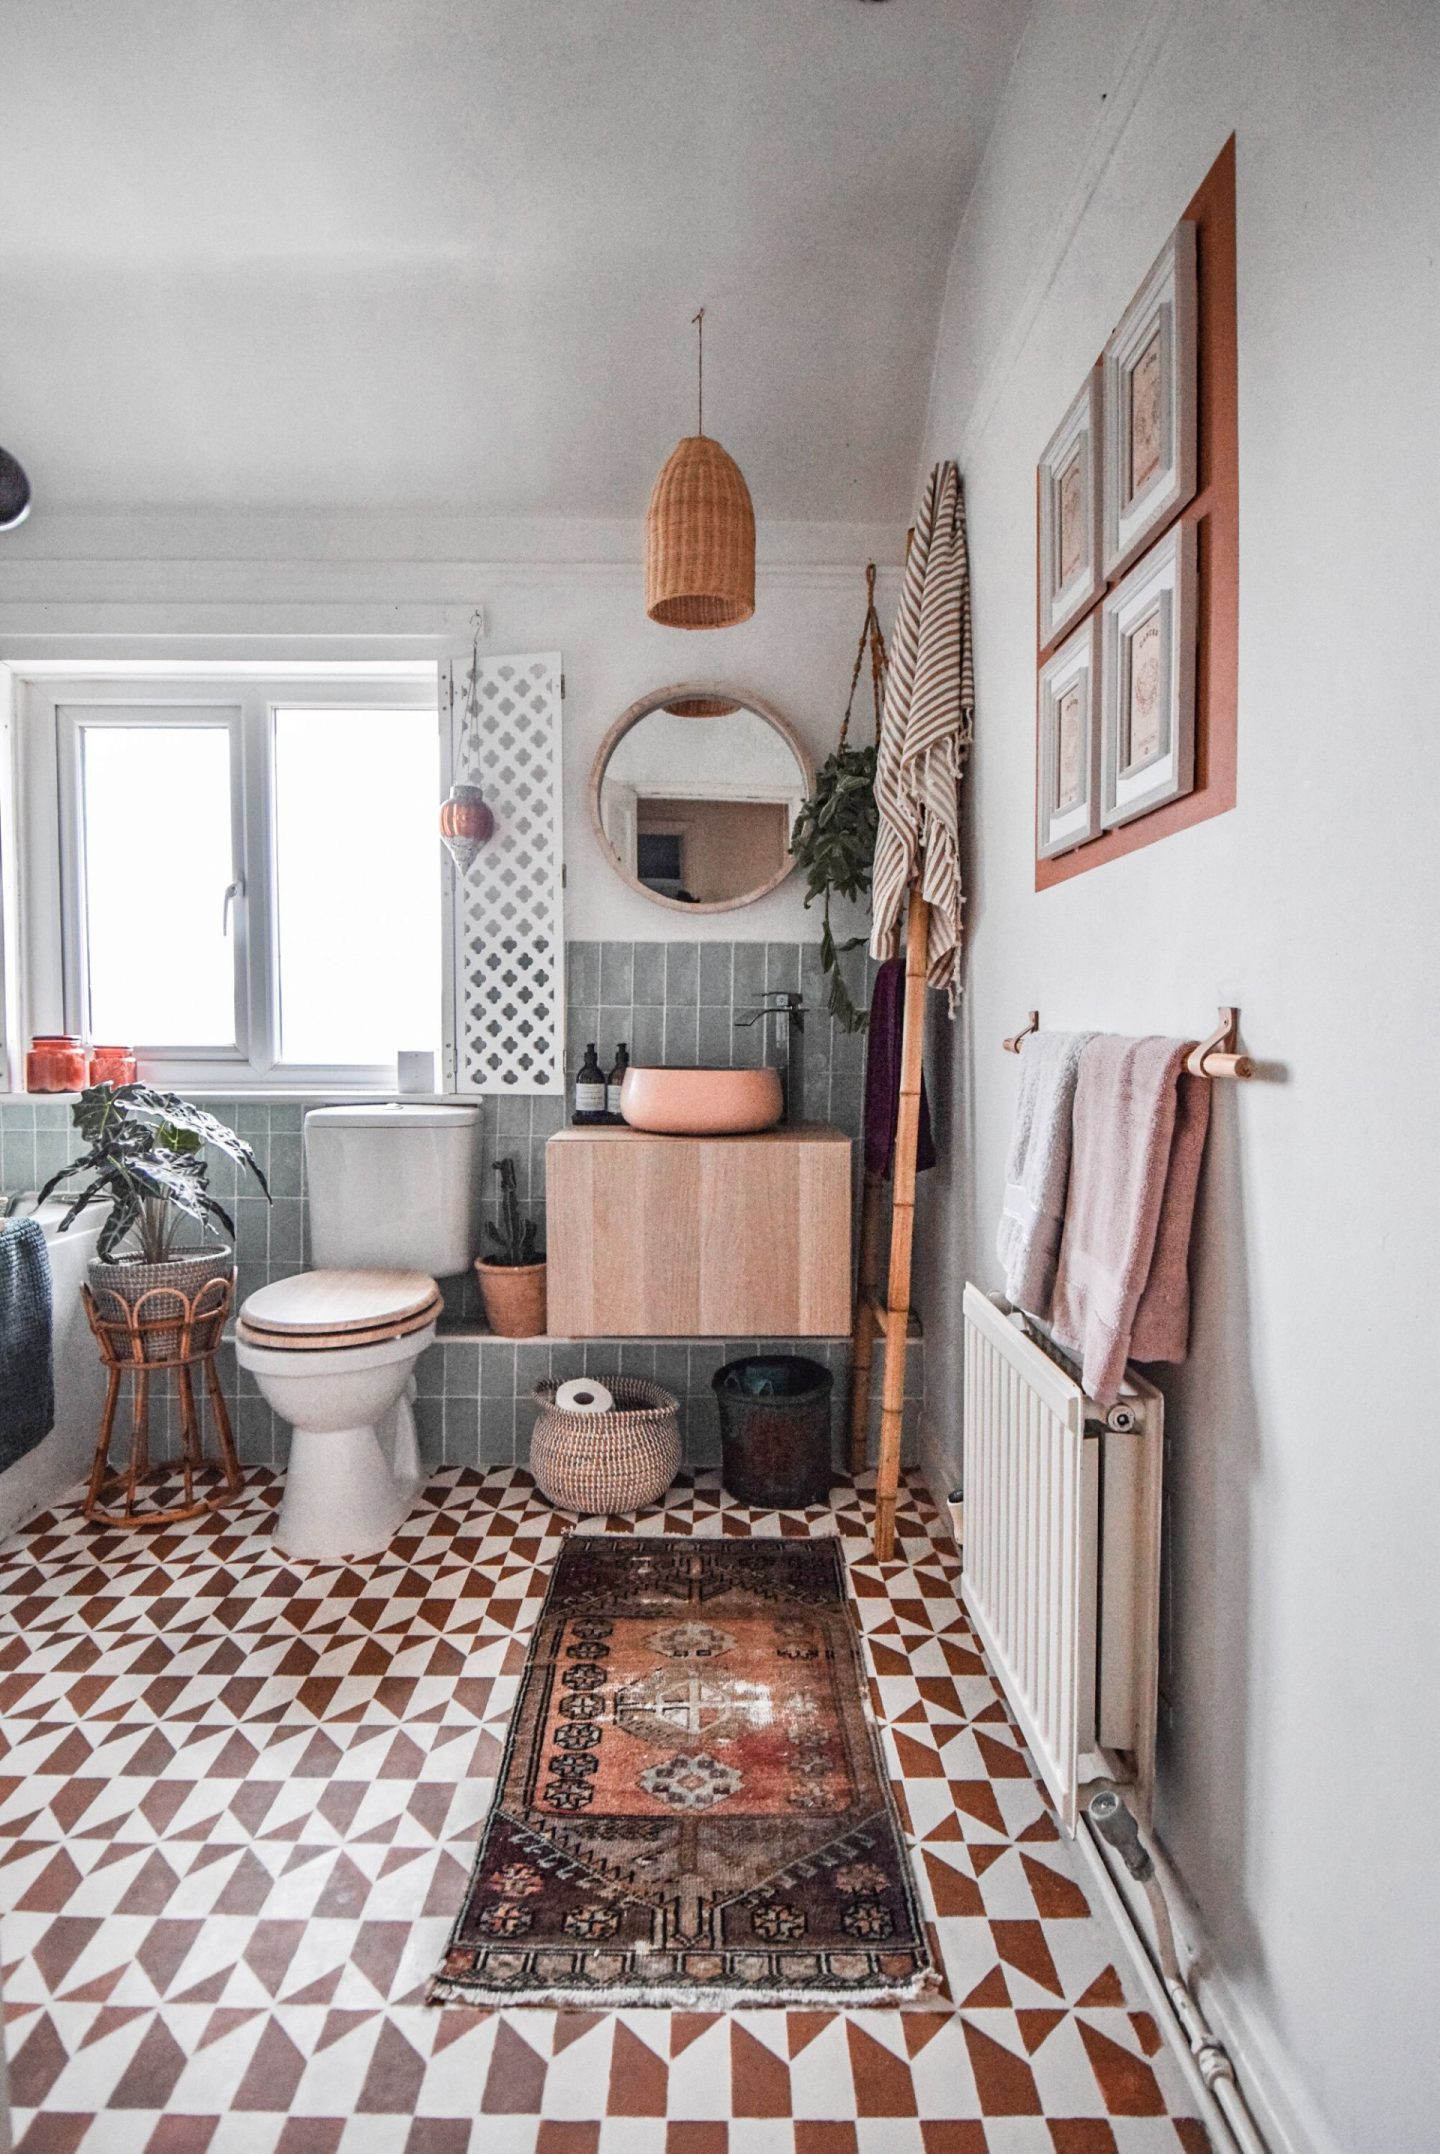 My bathroom revamp…